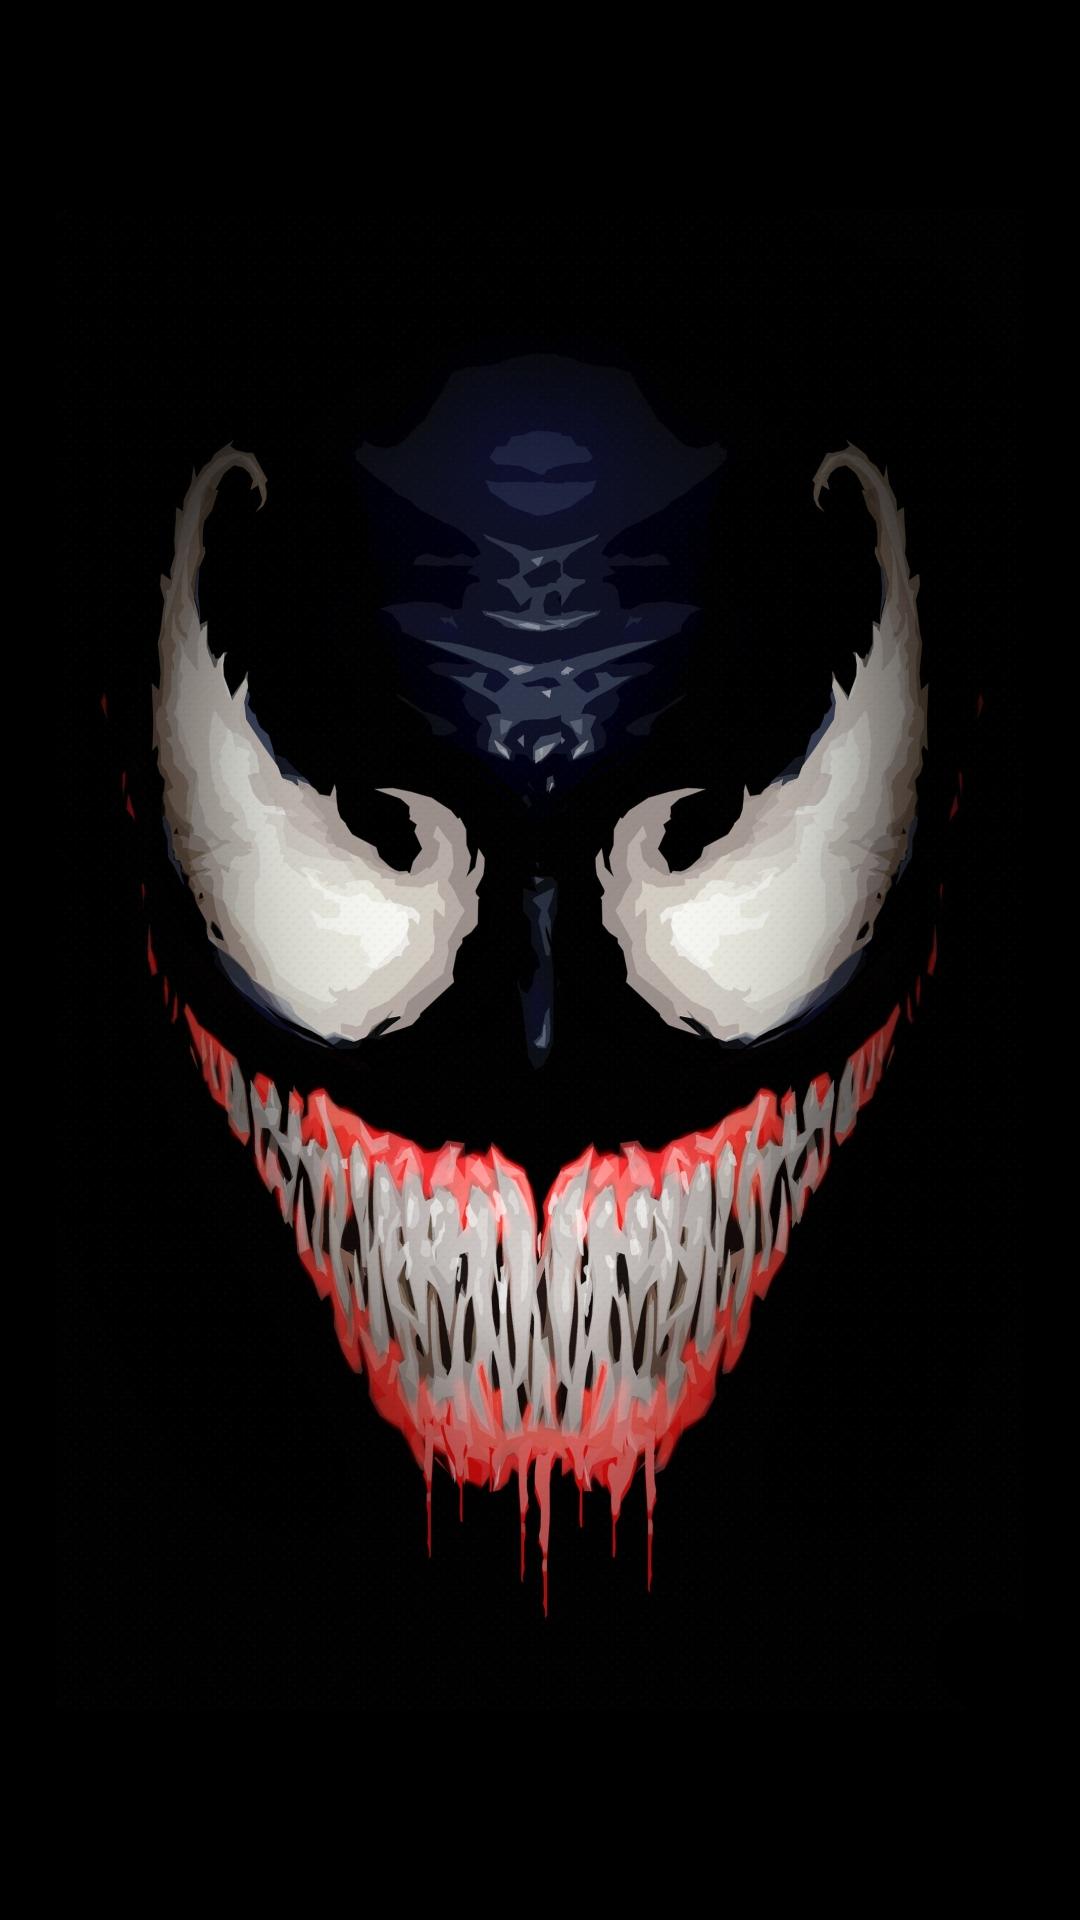 Download Venom Artwork Minimal 1152x864 Resolution Hd 8k Wallpaper